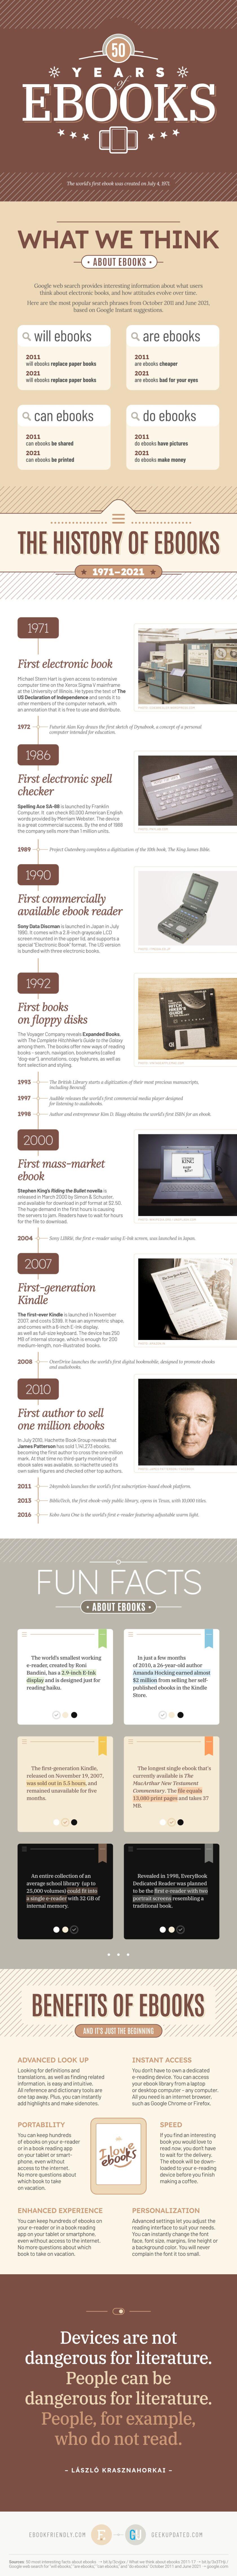 50 years of ebooks - full infographic